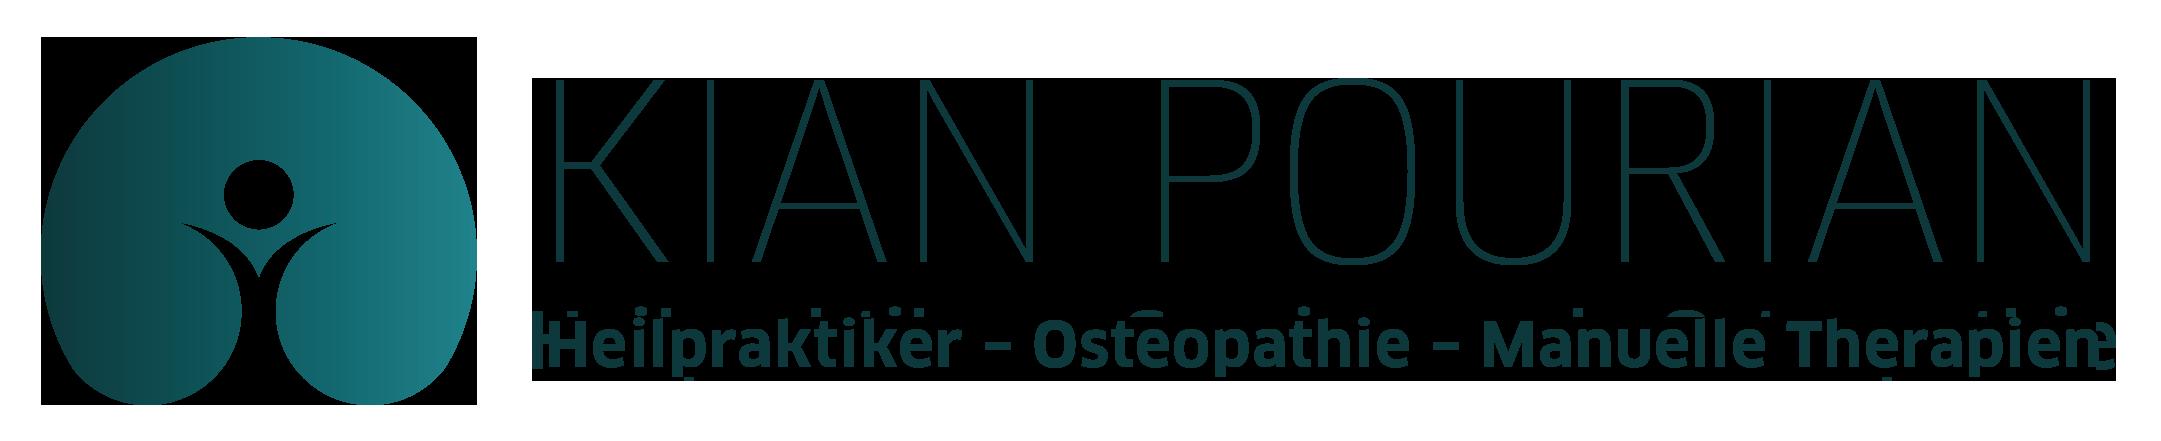 Kian Pourian – Heilpraktiker